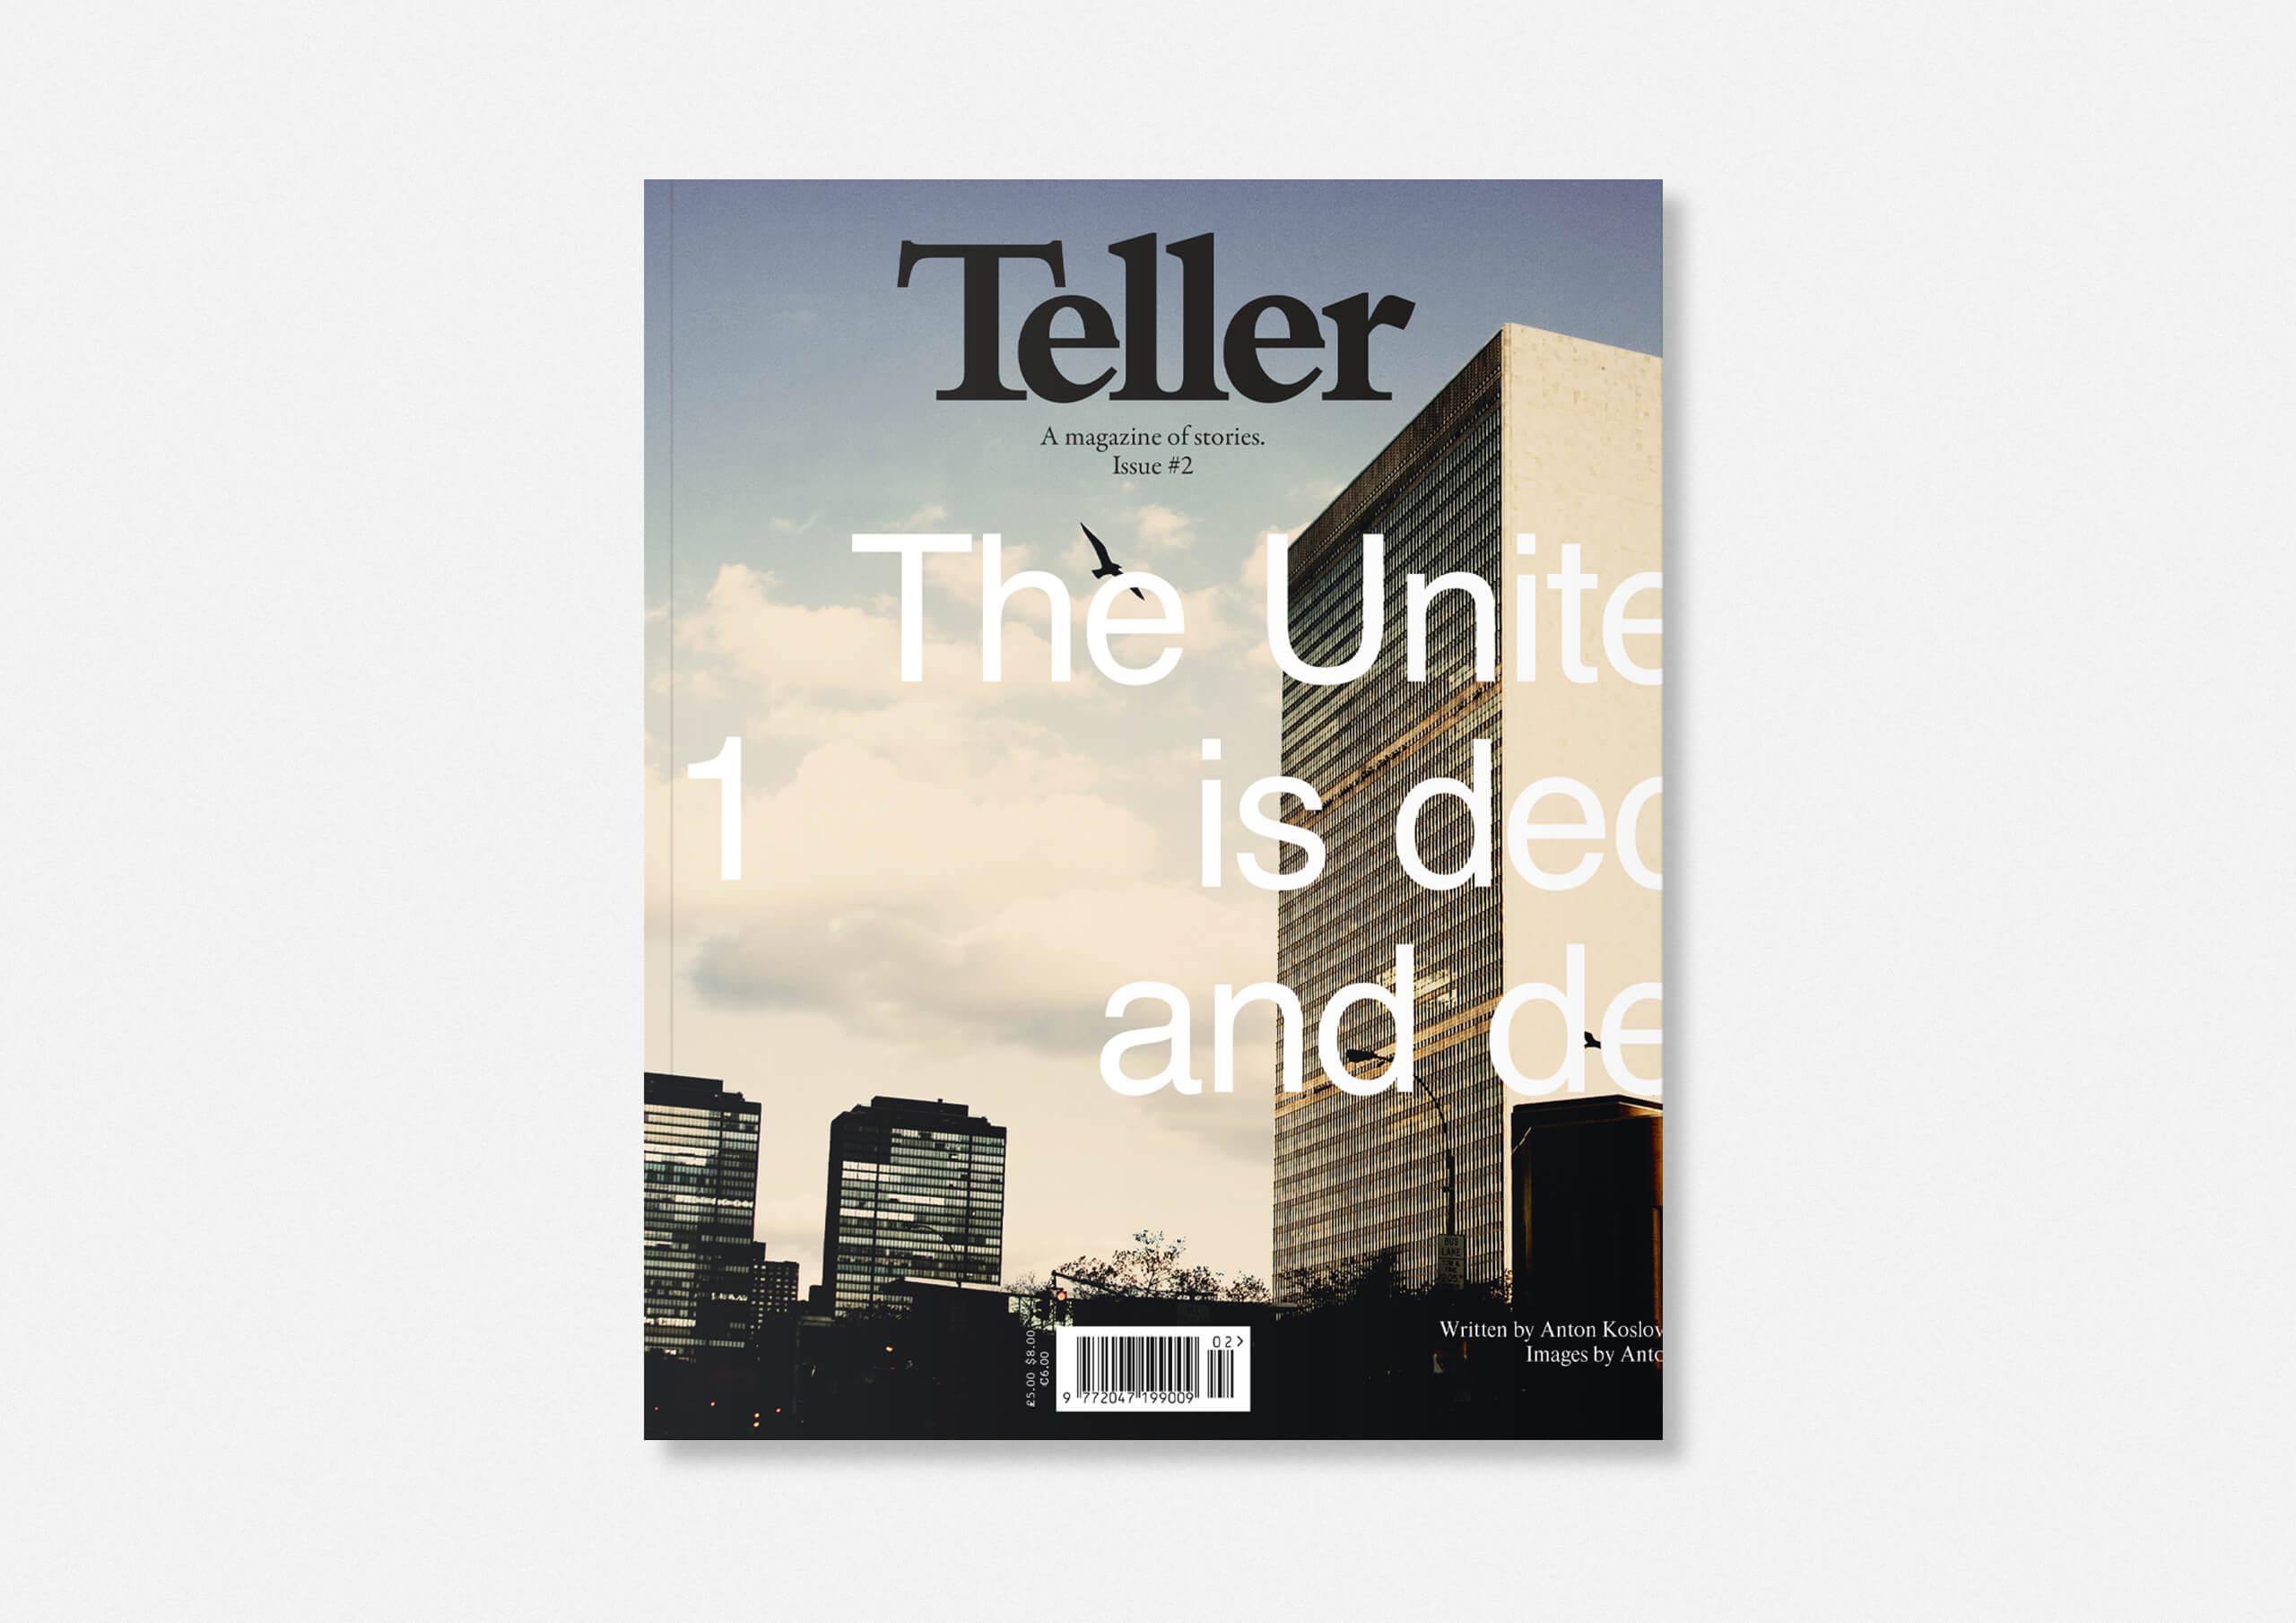 https://neuegestaltung.de/media/pages/clients/teller-magazine-issue-2/2919dd20d5-1602773596/teller-magazin-issue-02-thumbnail.jpg